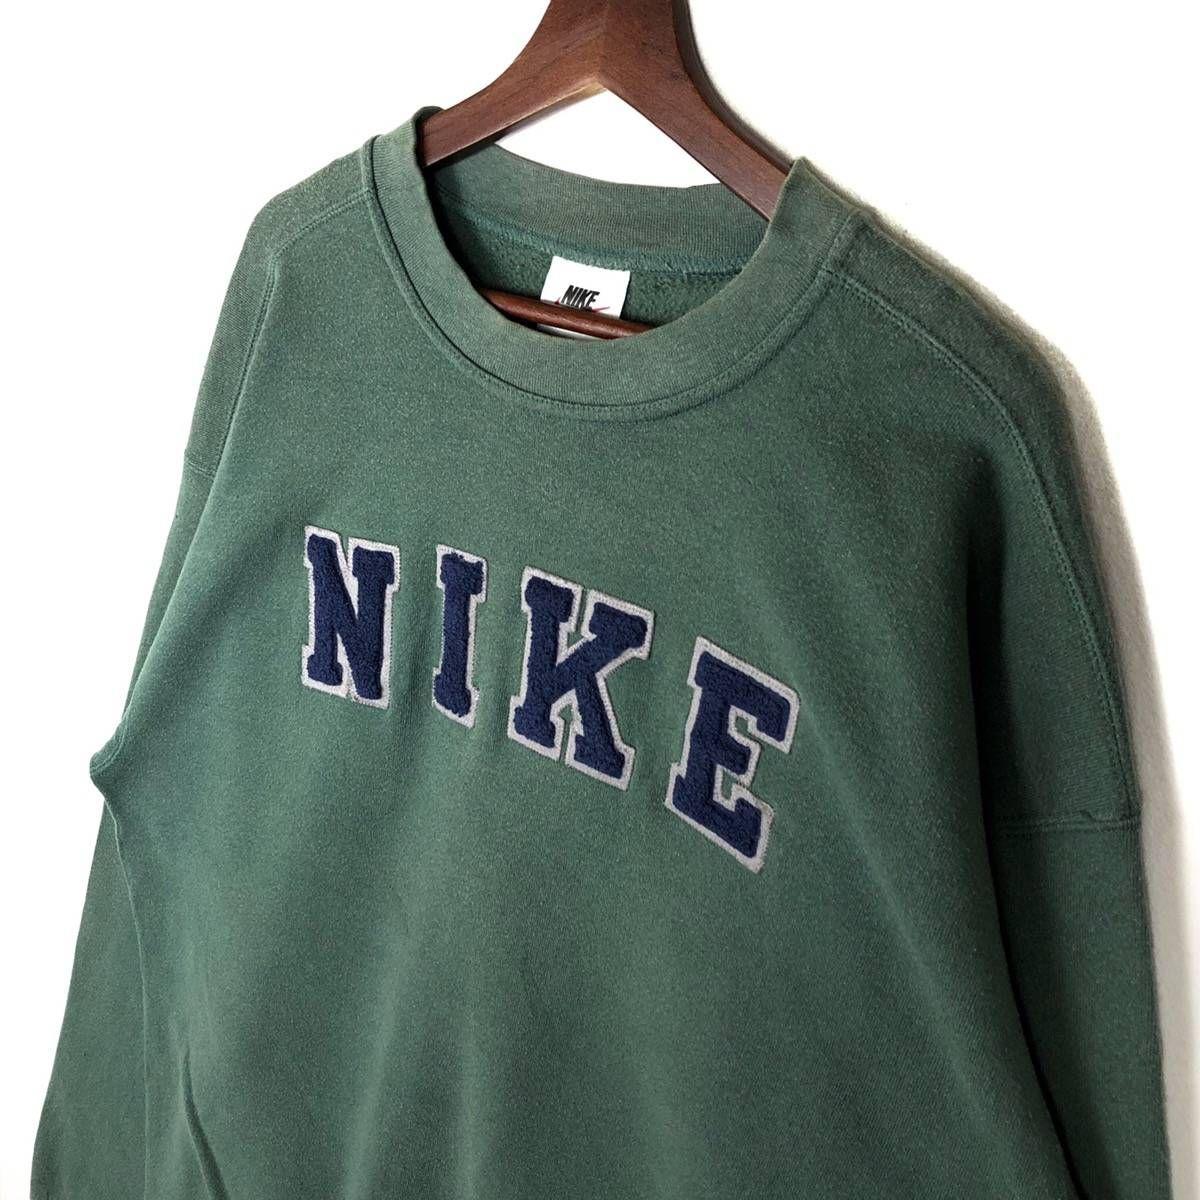 Nike 90 S Nike Crewneck Embroidery Nike Spellout Grailed Vintage Crewneck Sweatshirt Vintage Nike Sweatshirt Crewneck Outfit [ 1200 x 1200 Pixel ]